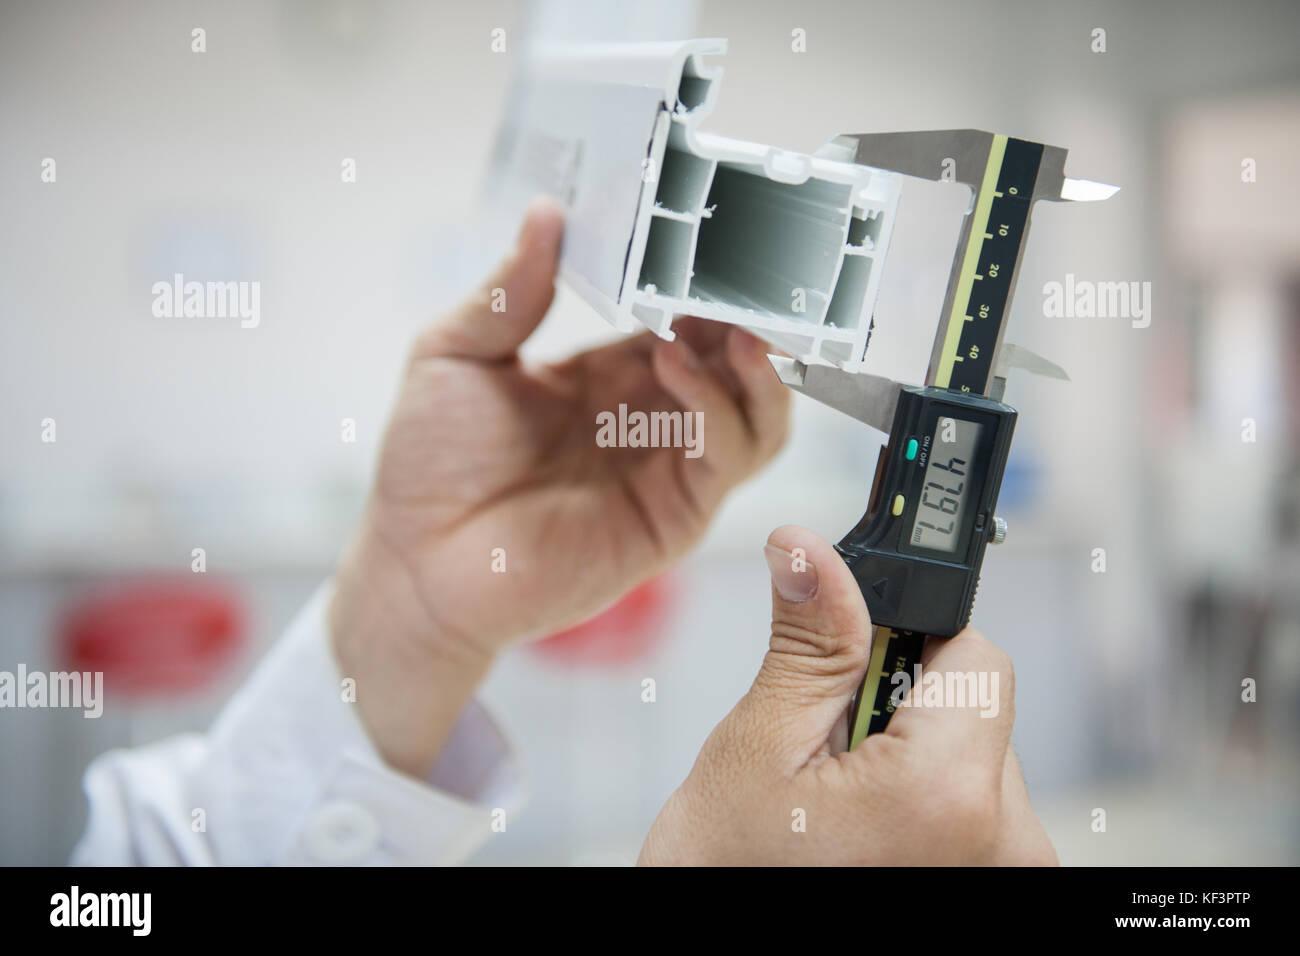 the laboratory technician measures the plastic profile with a digital caliper. application of digital caliper close - Stock Image